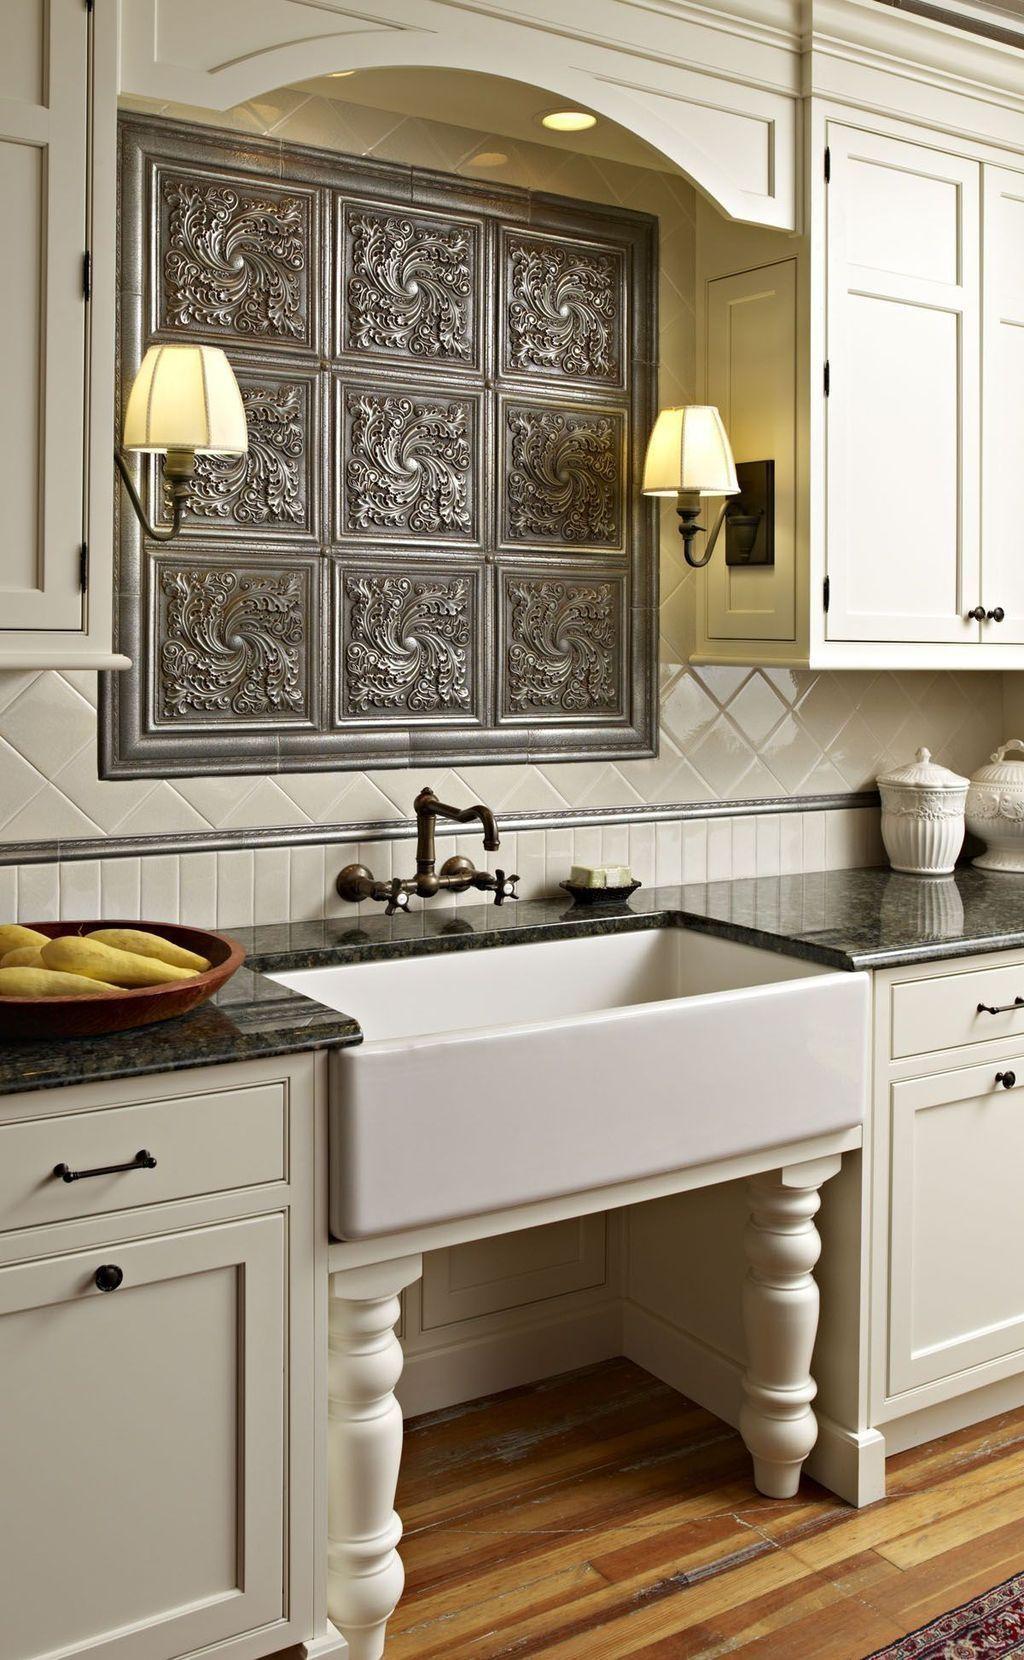 Kitchen Sink Plumbing Problems Solutions Kitchensinkplumbing Farmhouse Sink Farmhouse Kitchen Backsplash Farmhouse Sink Kitchen Kitchen Backsplash Designs